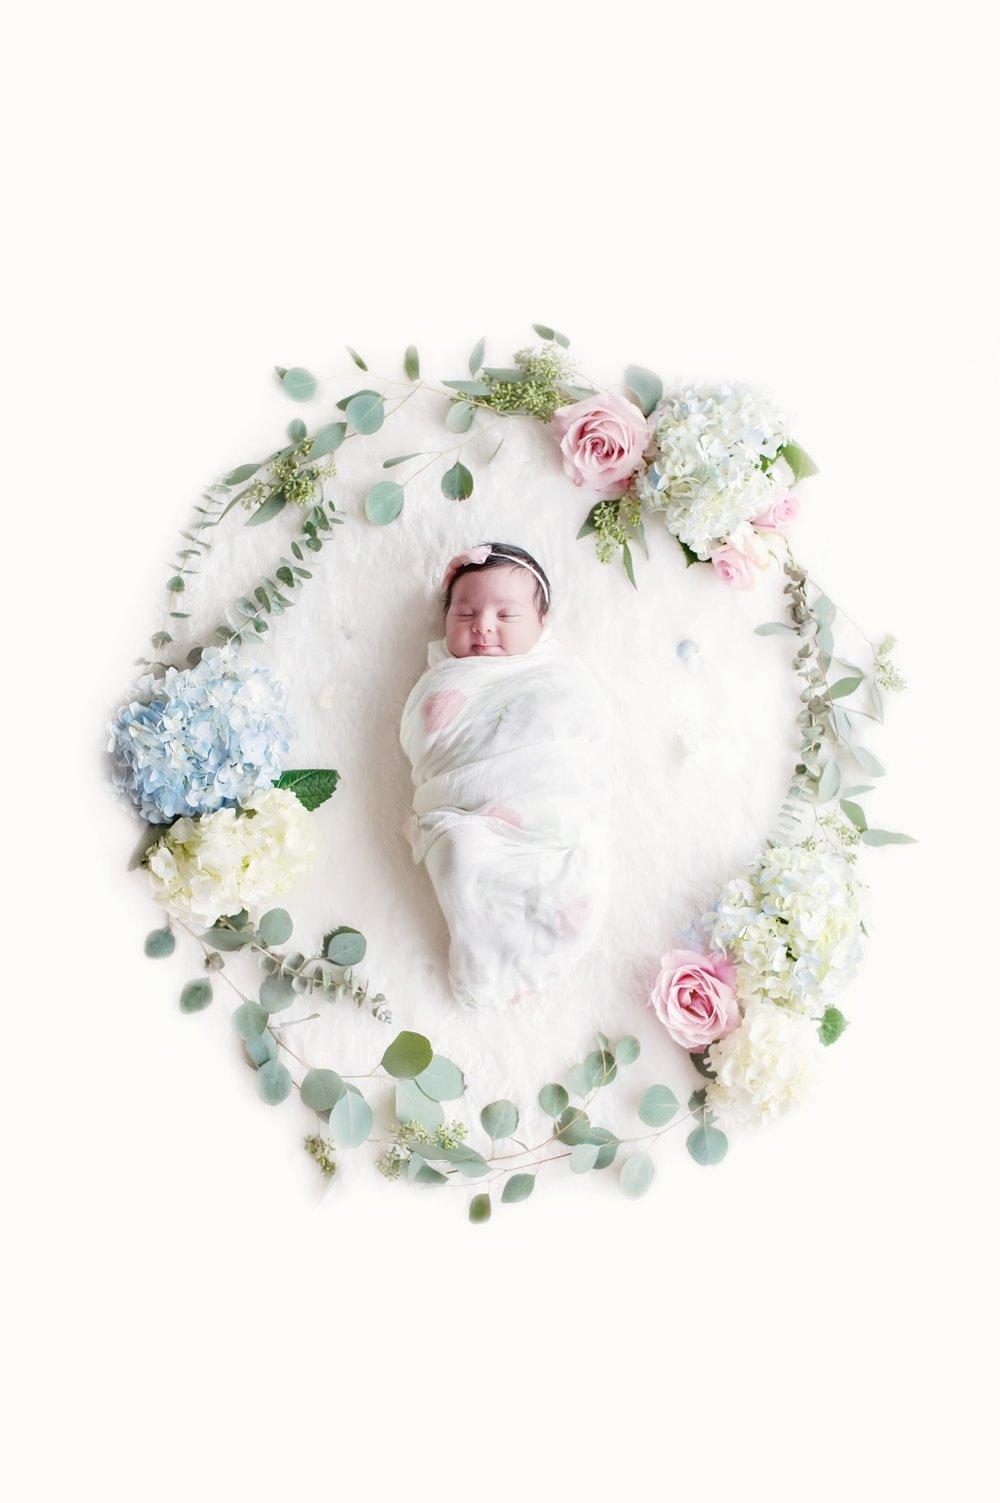 Emilia_Ruggeri_Newborn_-_53.jpg